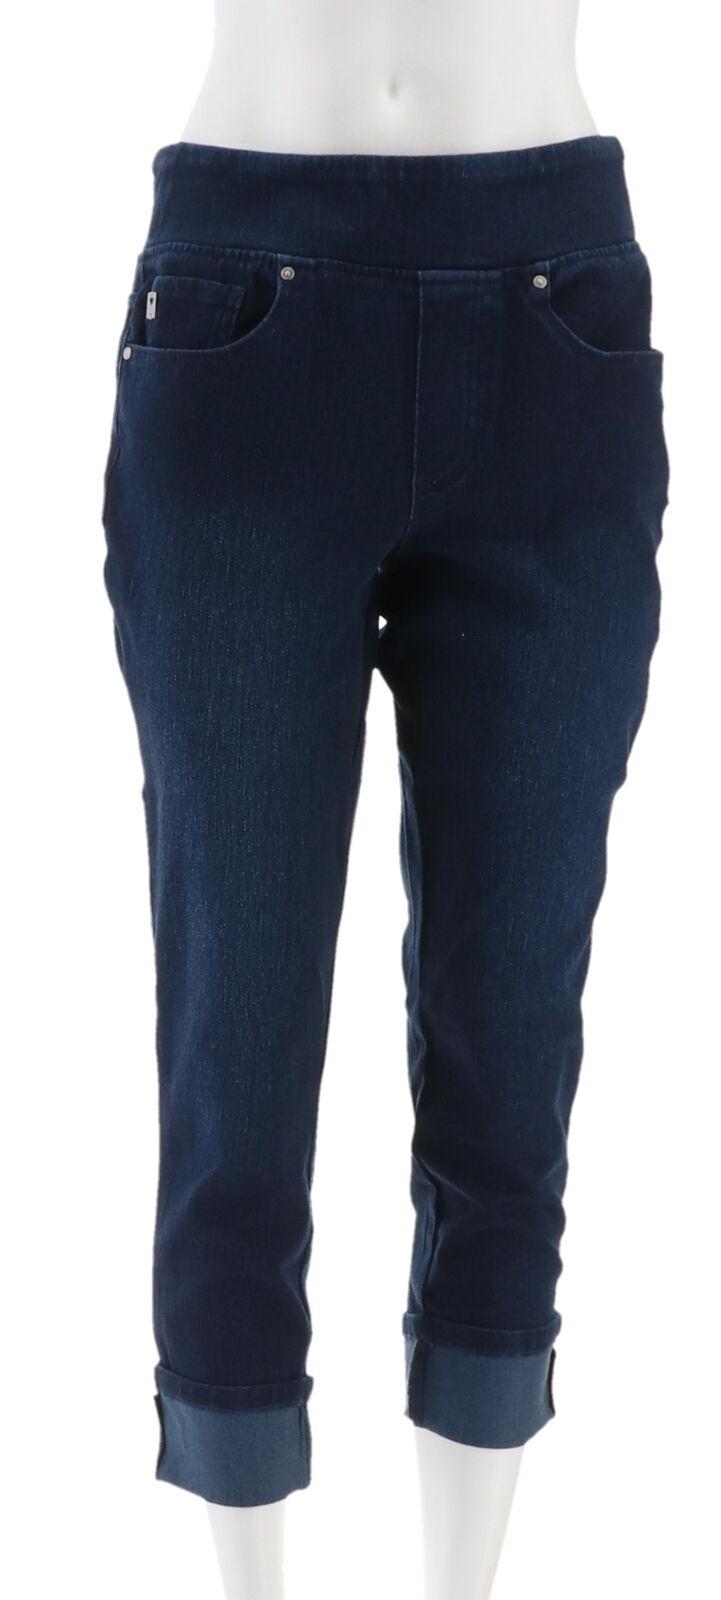 Belle Kim Gravel Flexibelle Cuffed Jeans Dark Indigo 10 NEW A345862